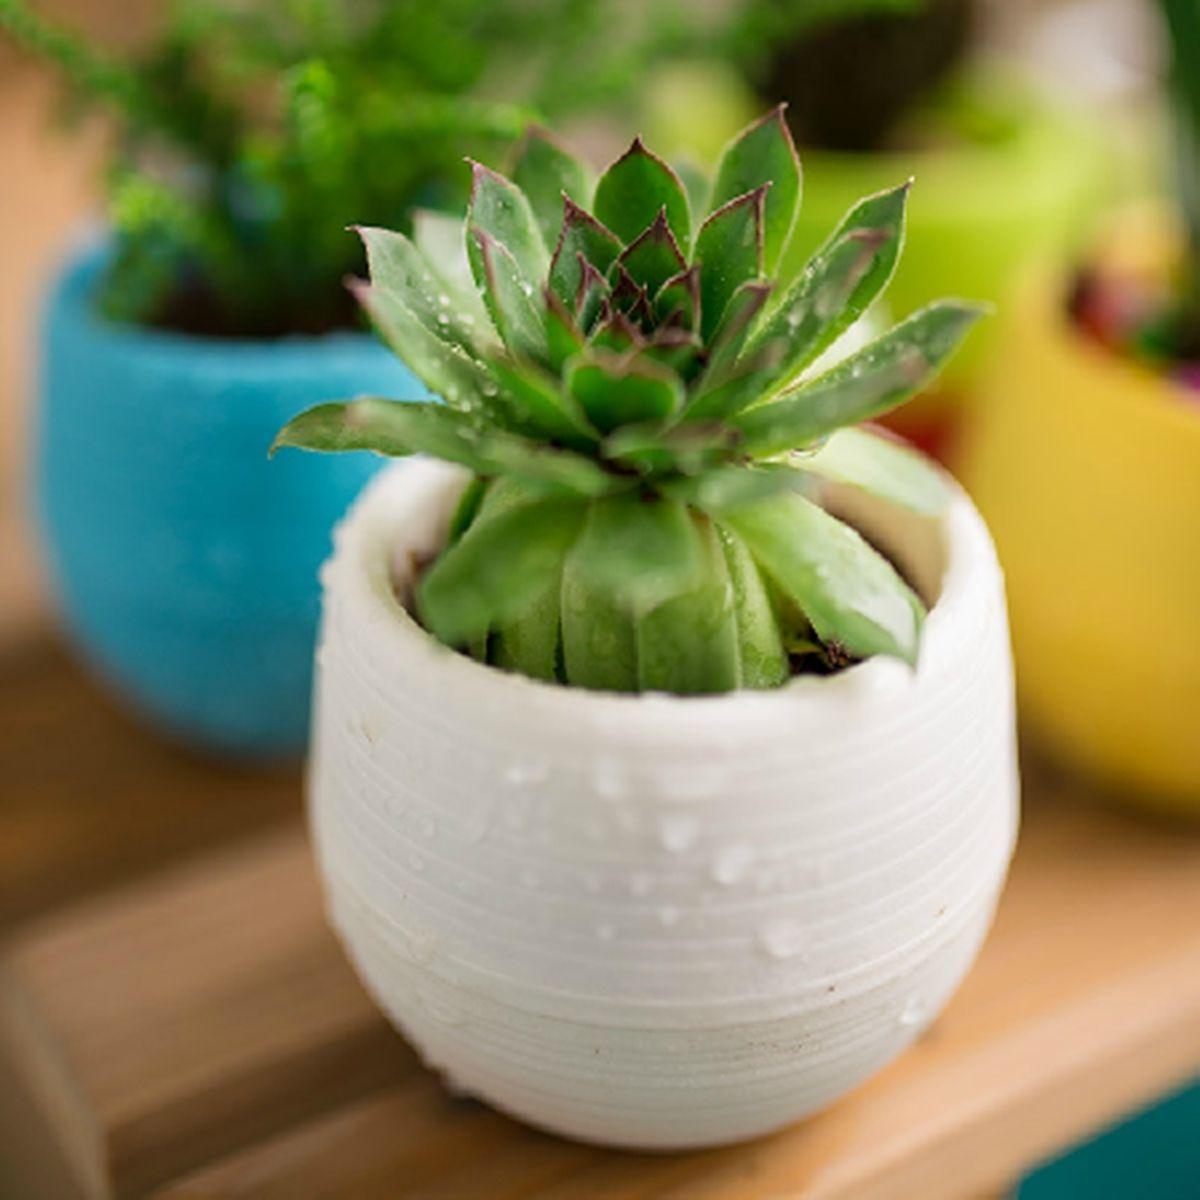 Flower Pots Mini Flowerpot Unbreakable Plastic Nursery Pots Adorable Afforest Aid Good Helper use for garden